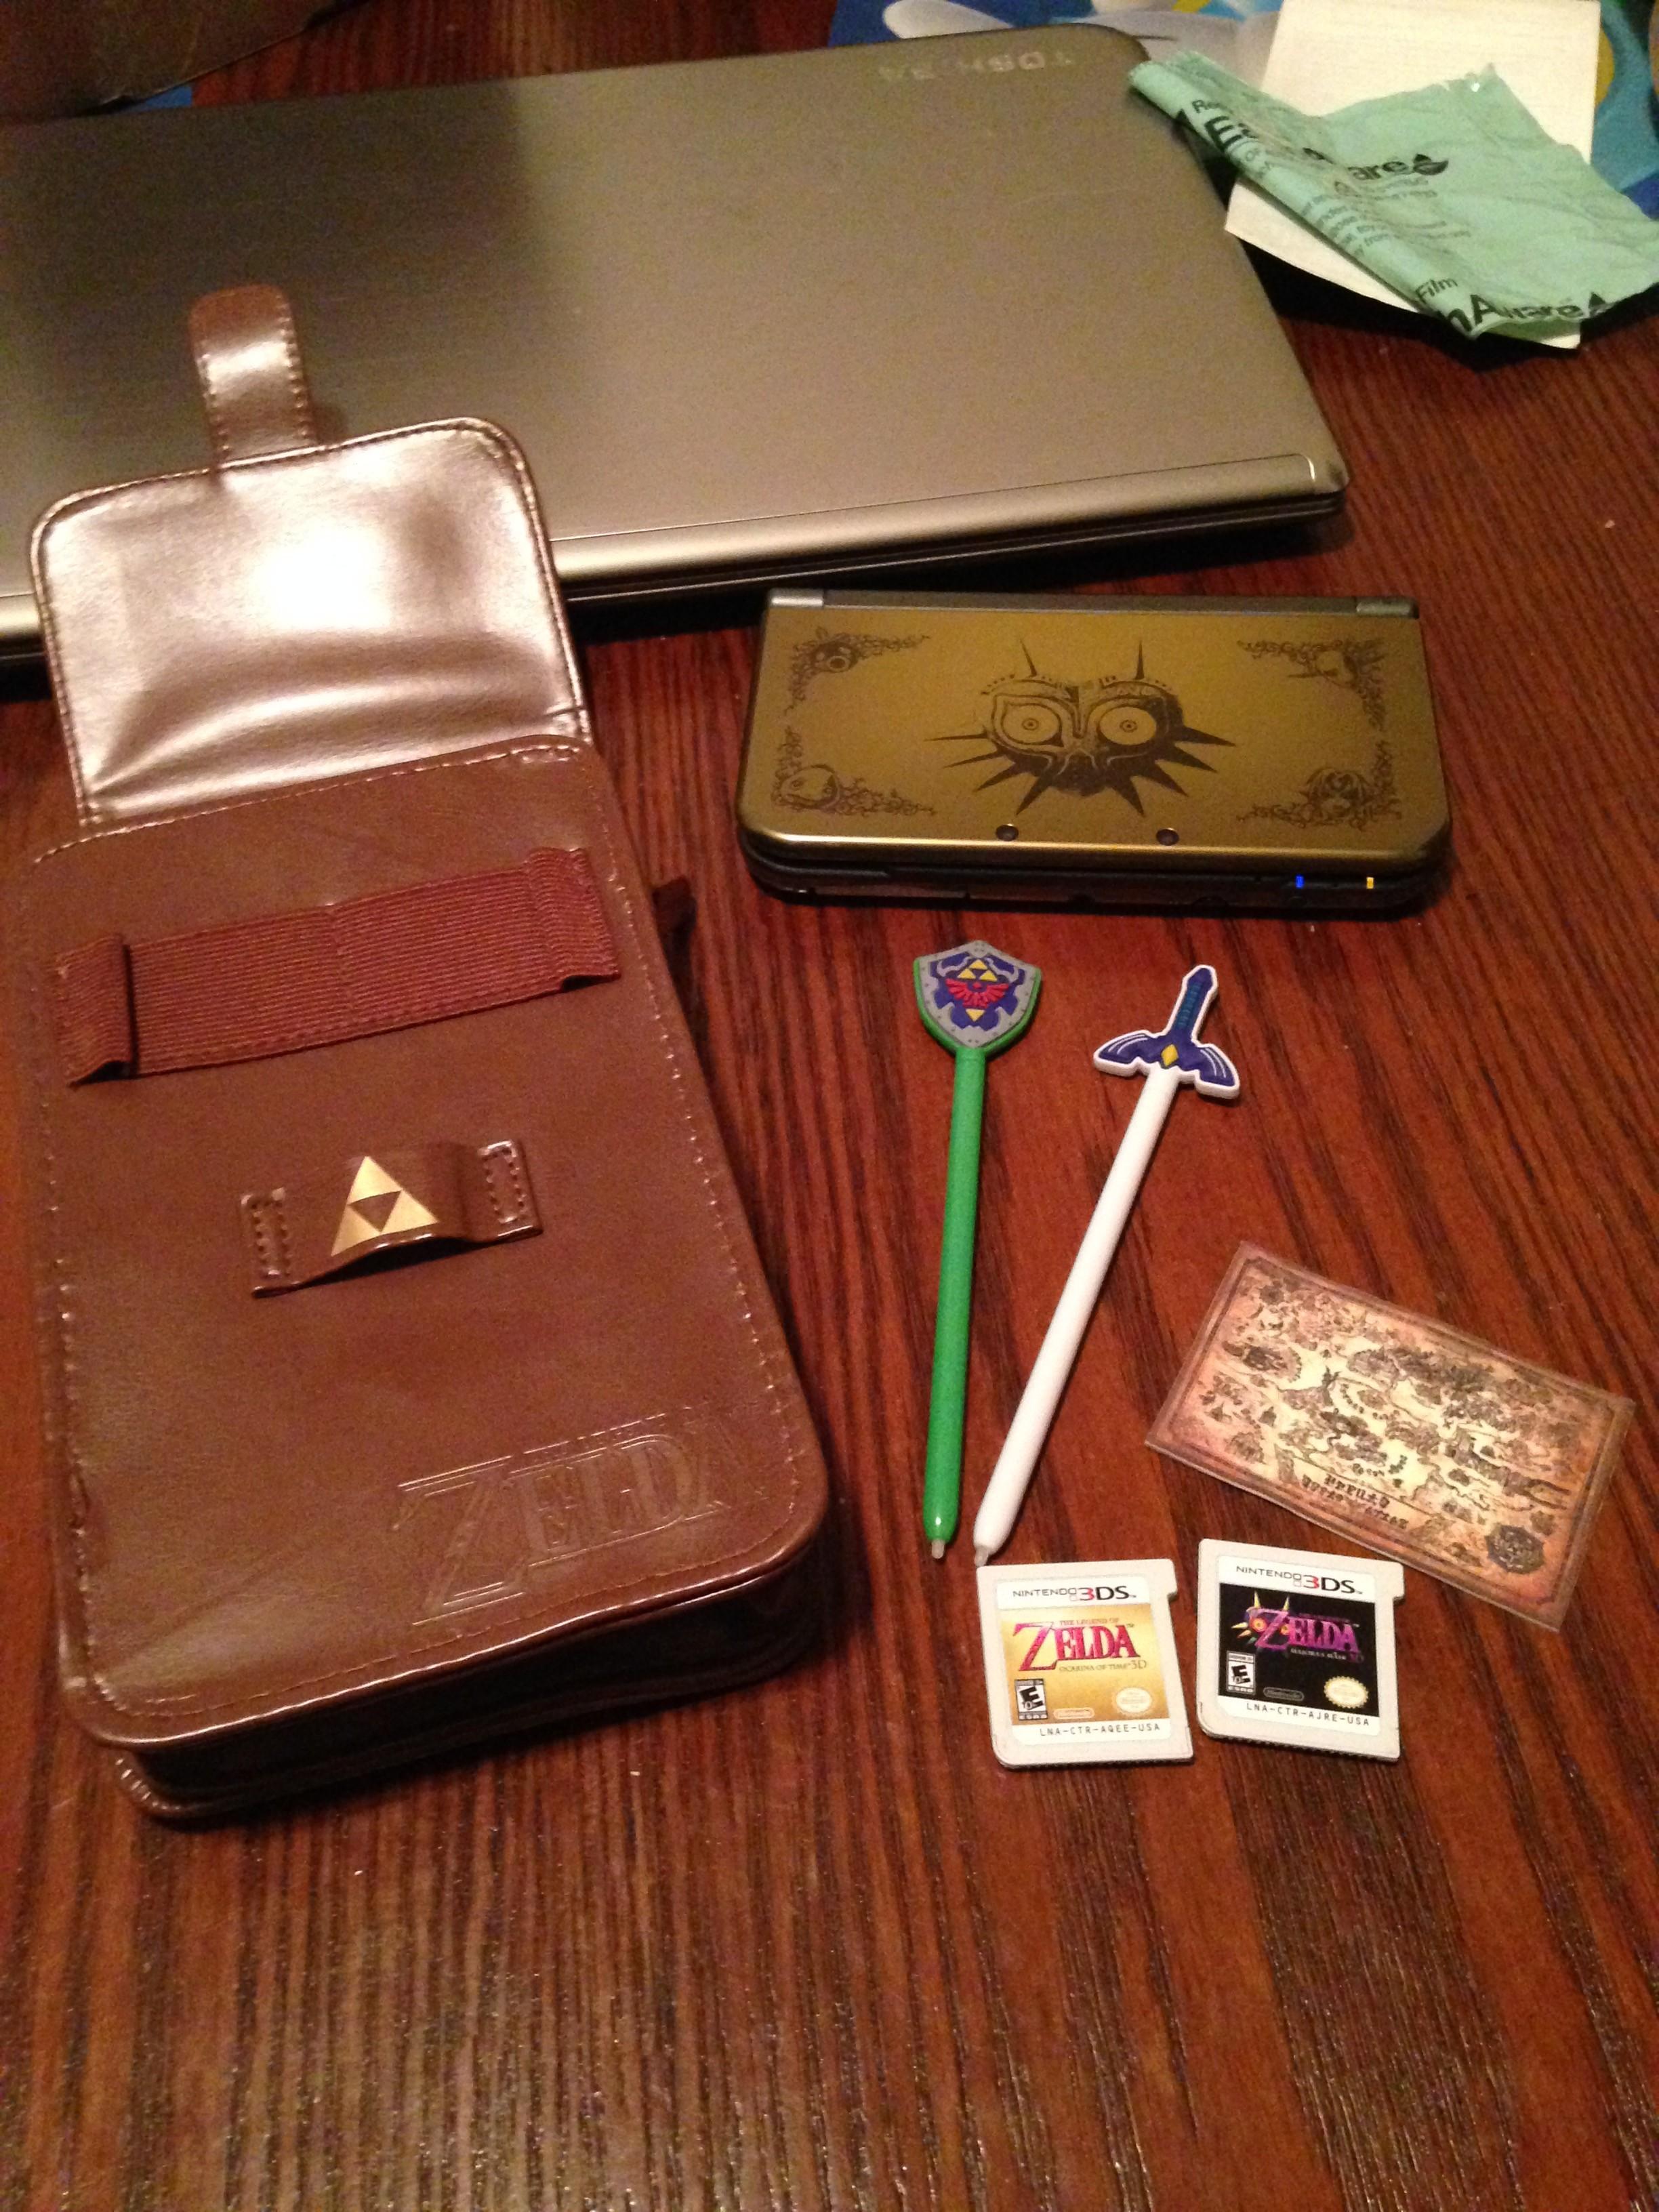 Adventure Pouch 3DS Case Unboxing – Zelda Dungeon